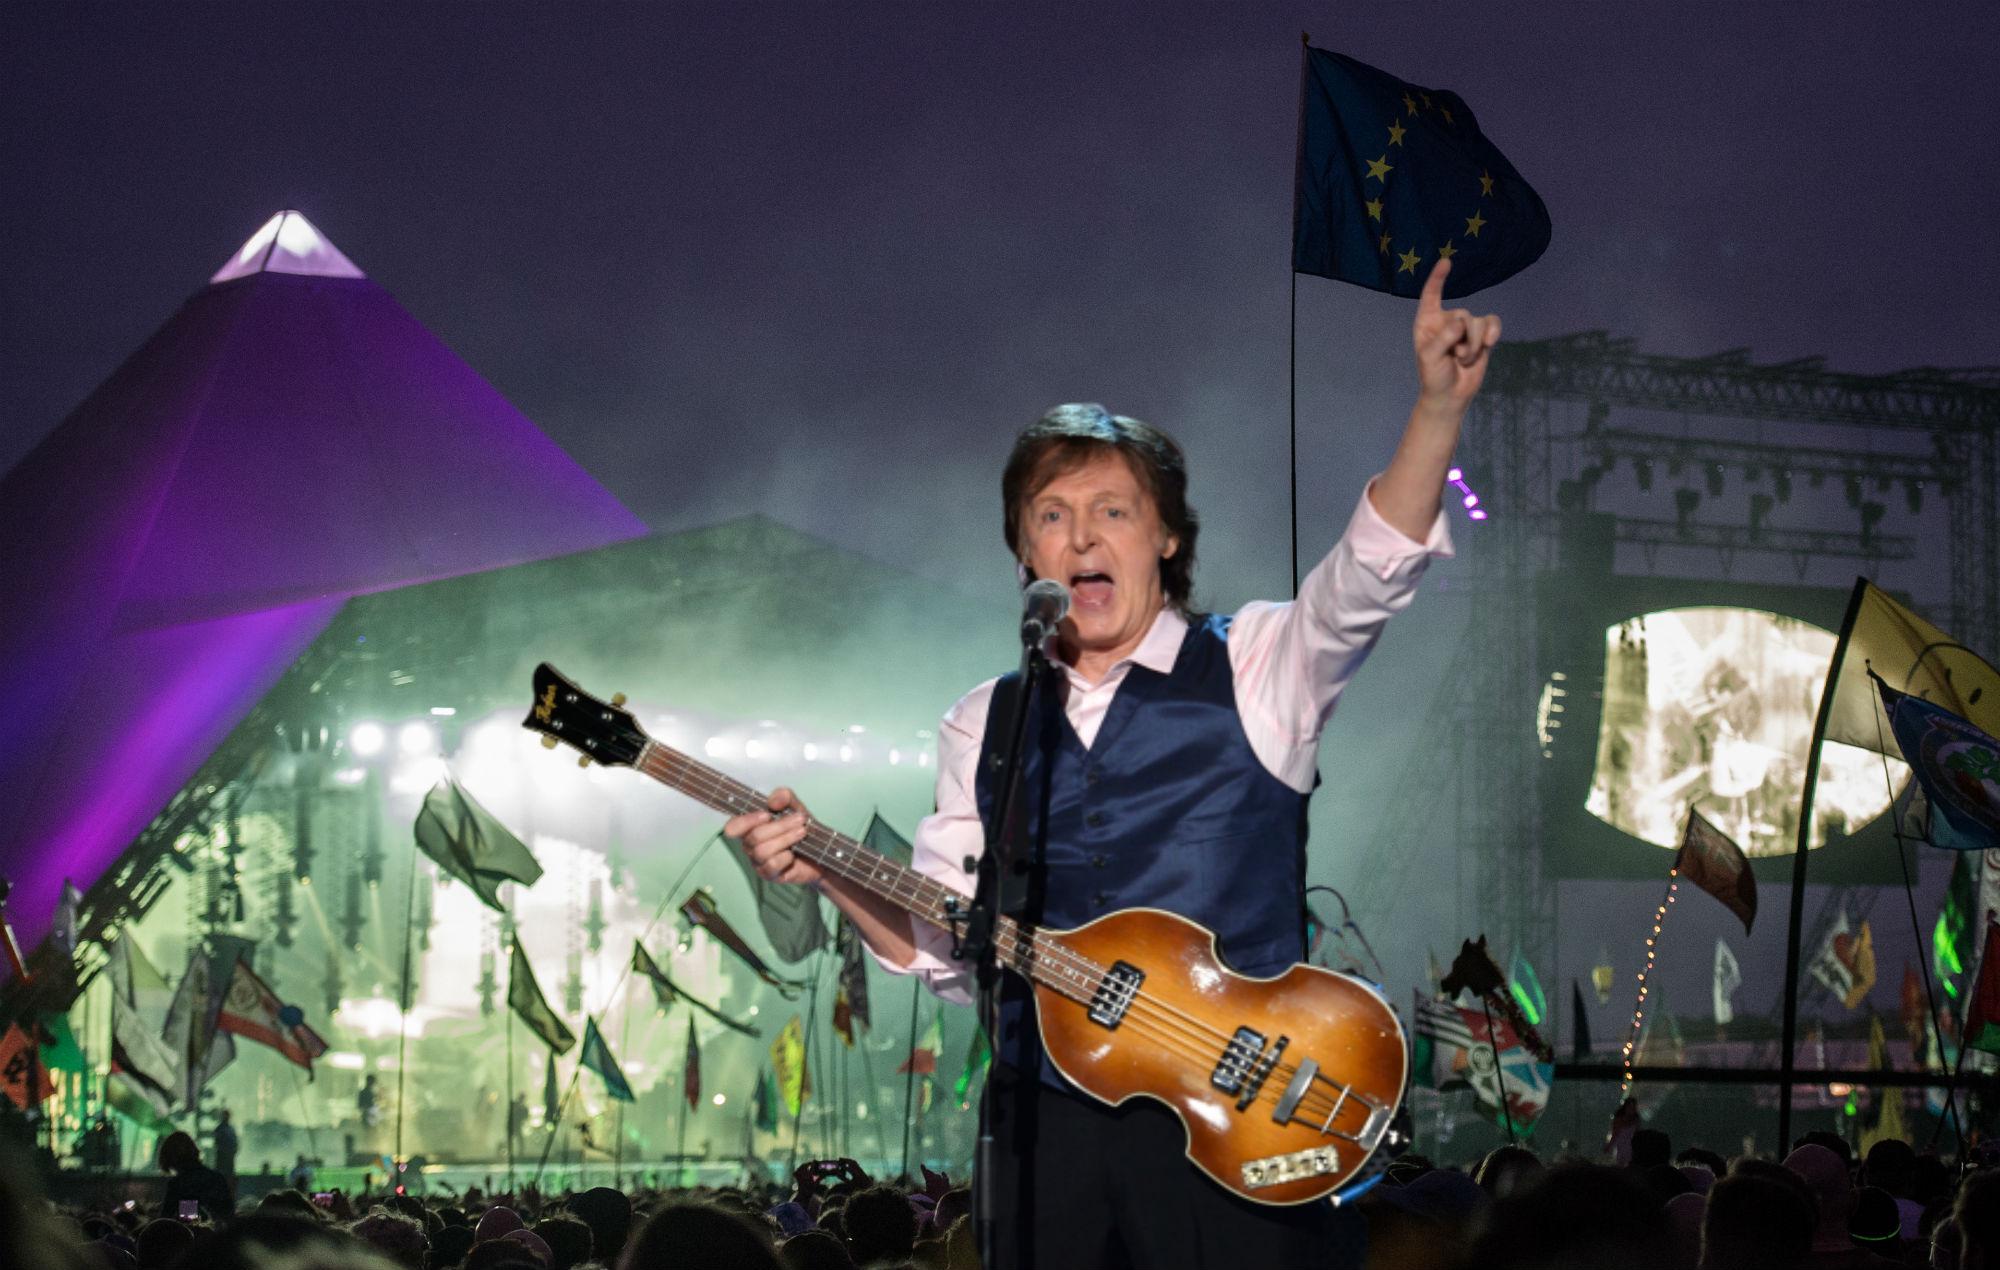 Emily Eavis confirms Paul McCartney will headline Glastonbury